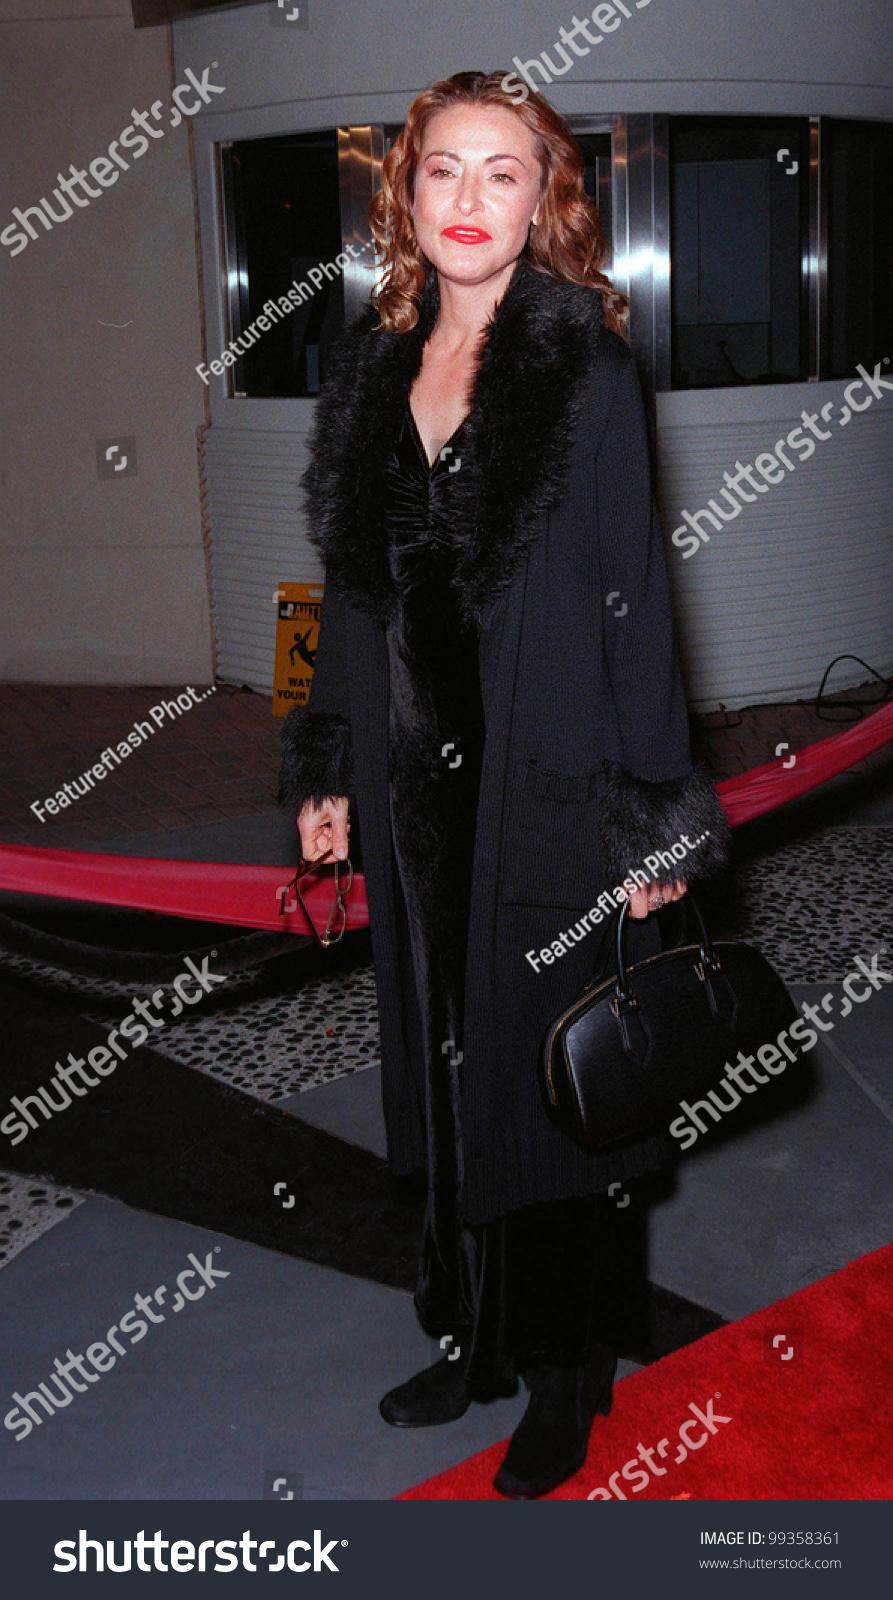 Rachel Nichols Actress Smoking Wwwtollebildcom